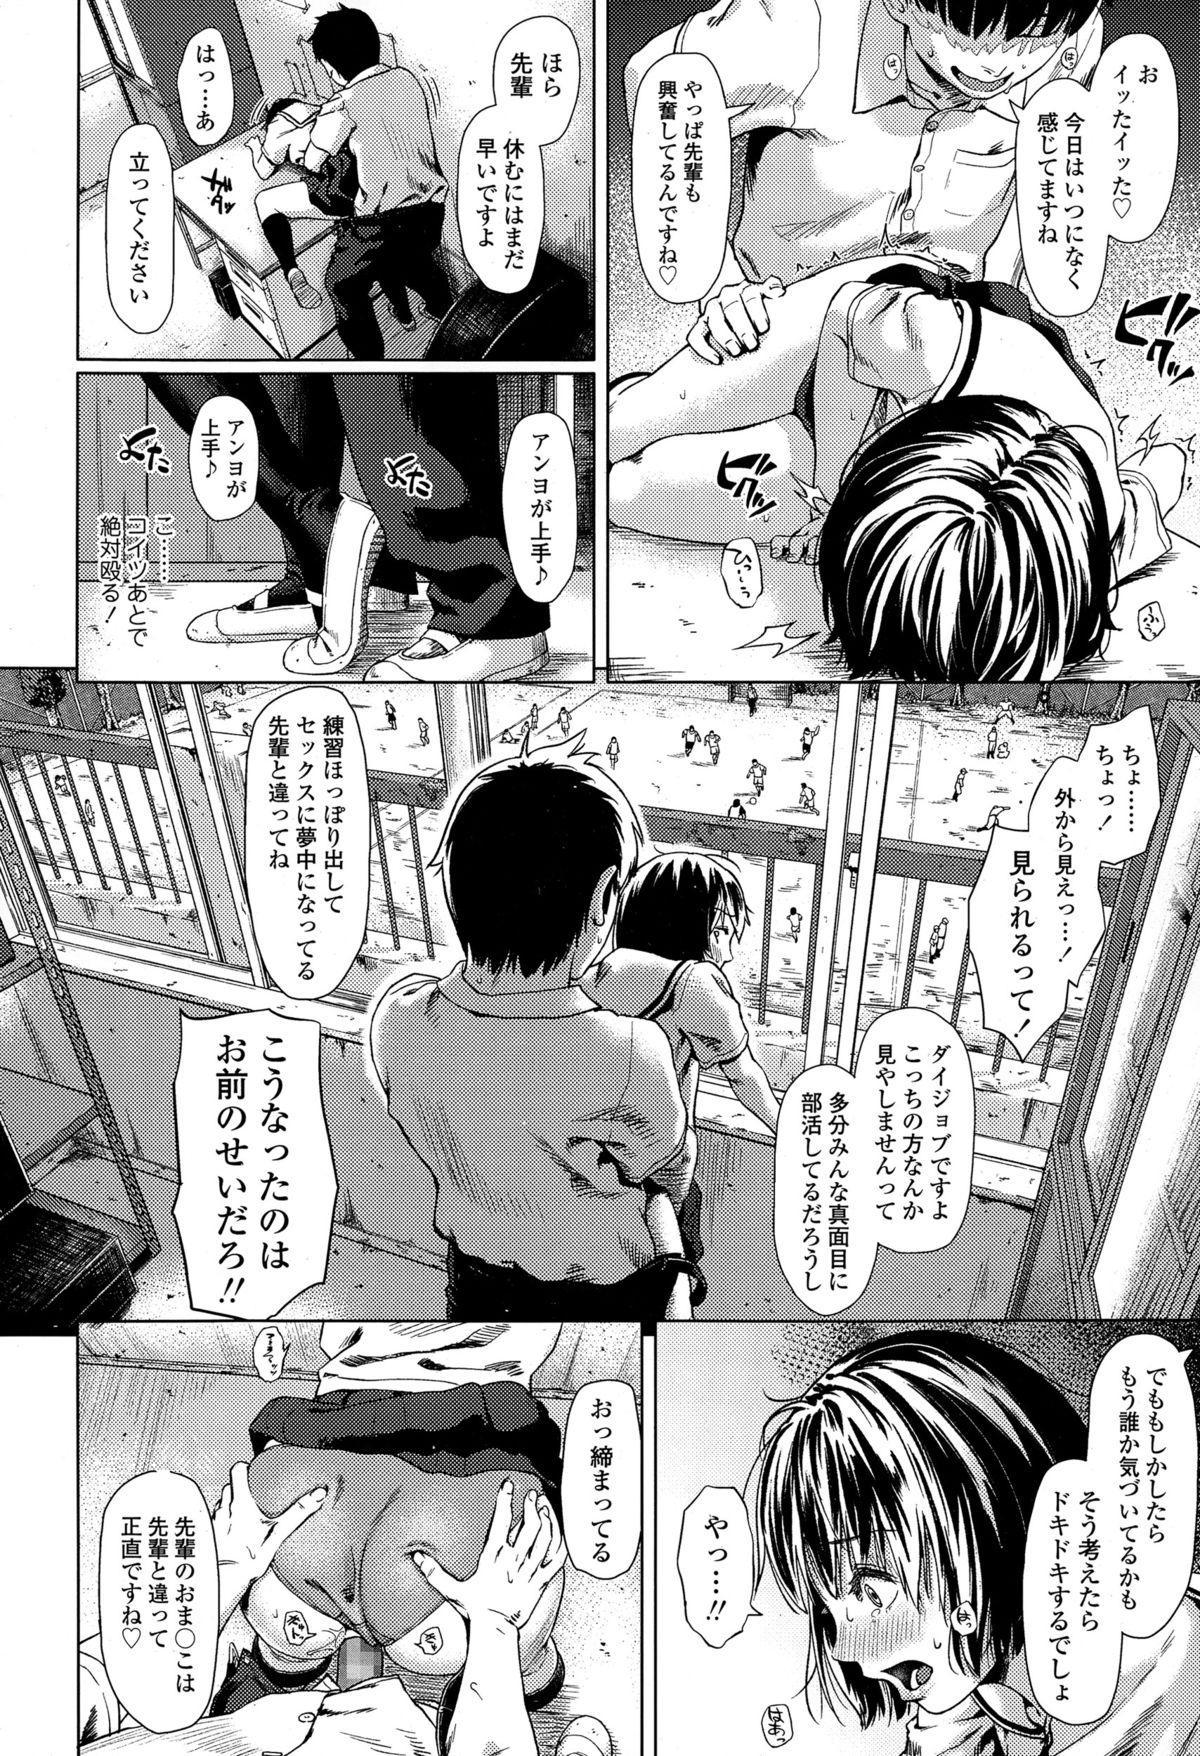 COMIC Koh Vol.4 59